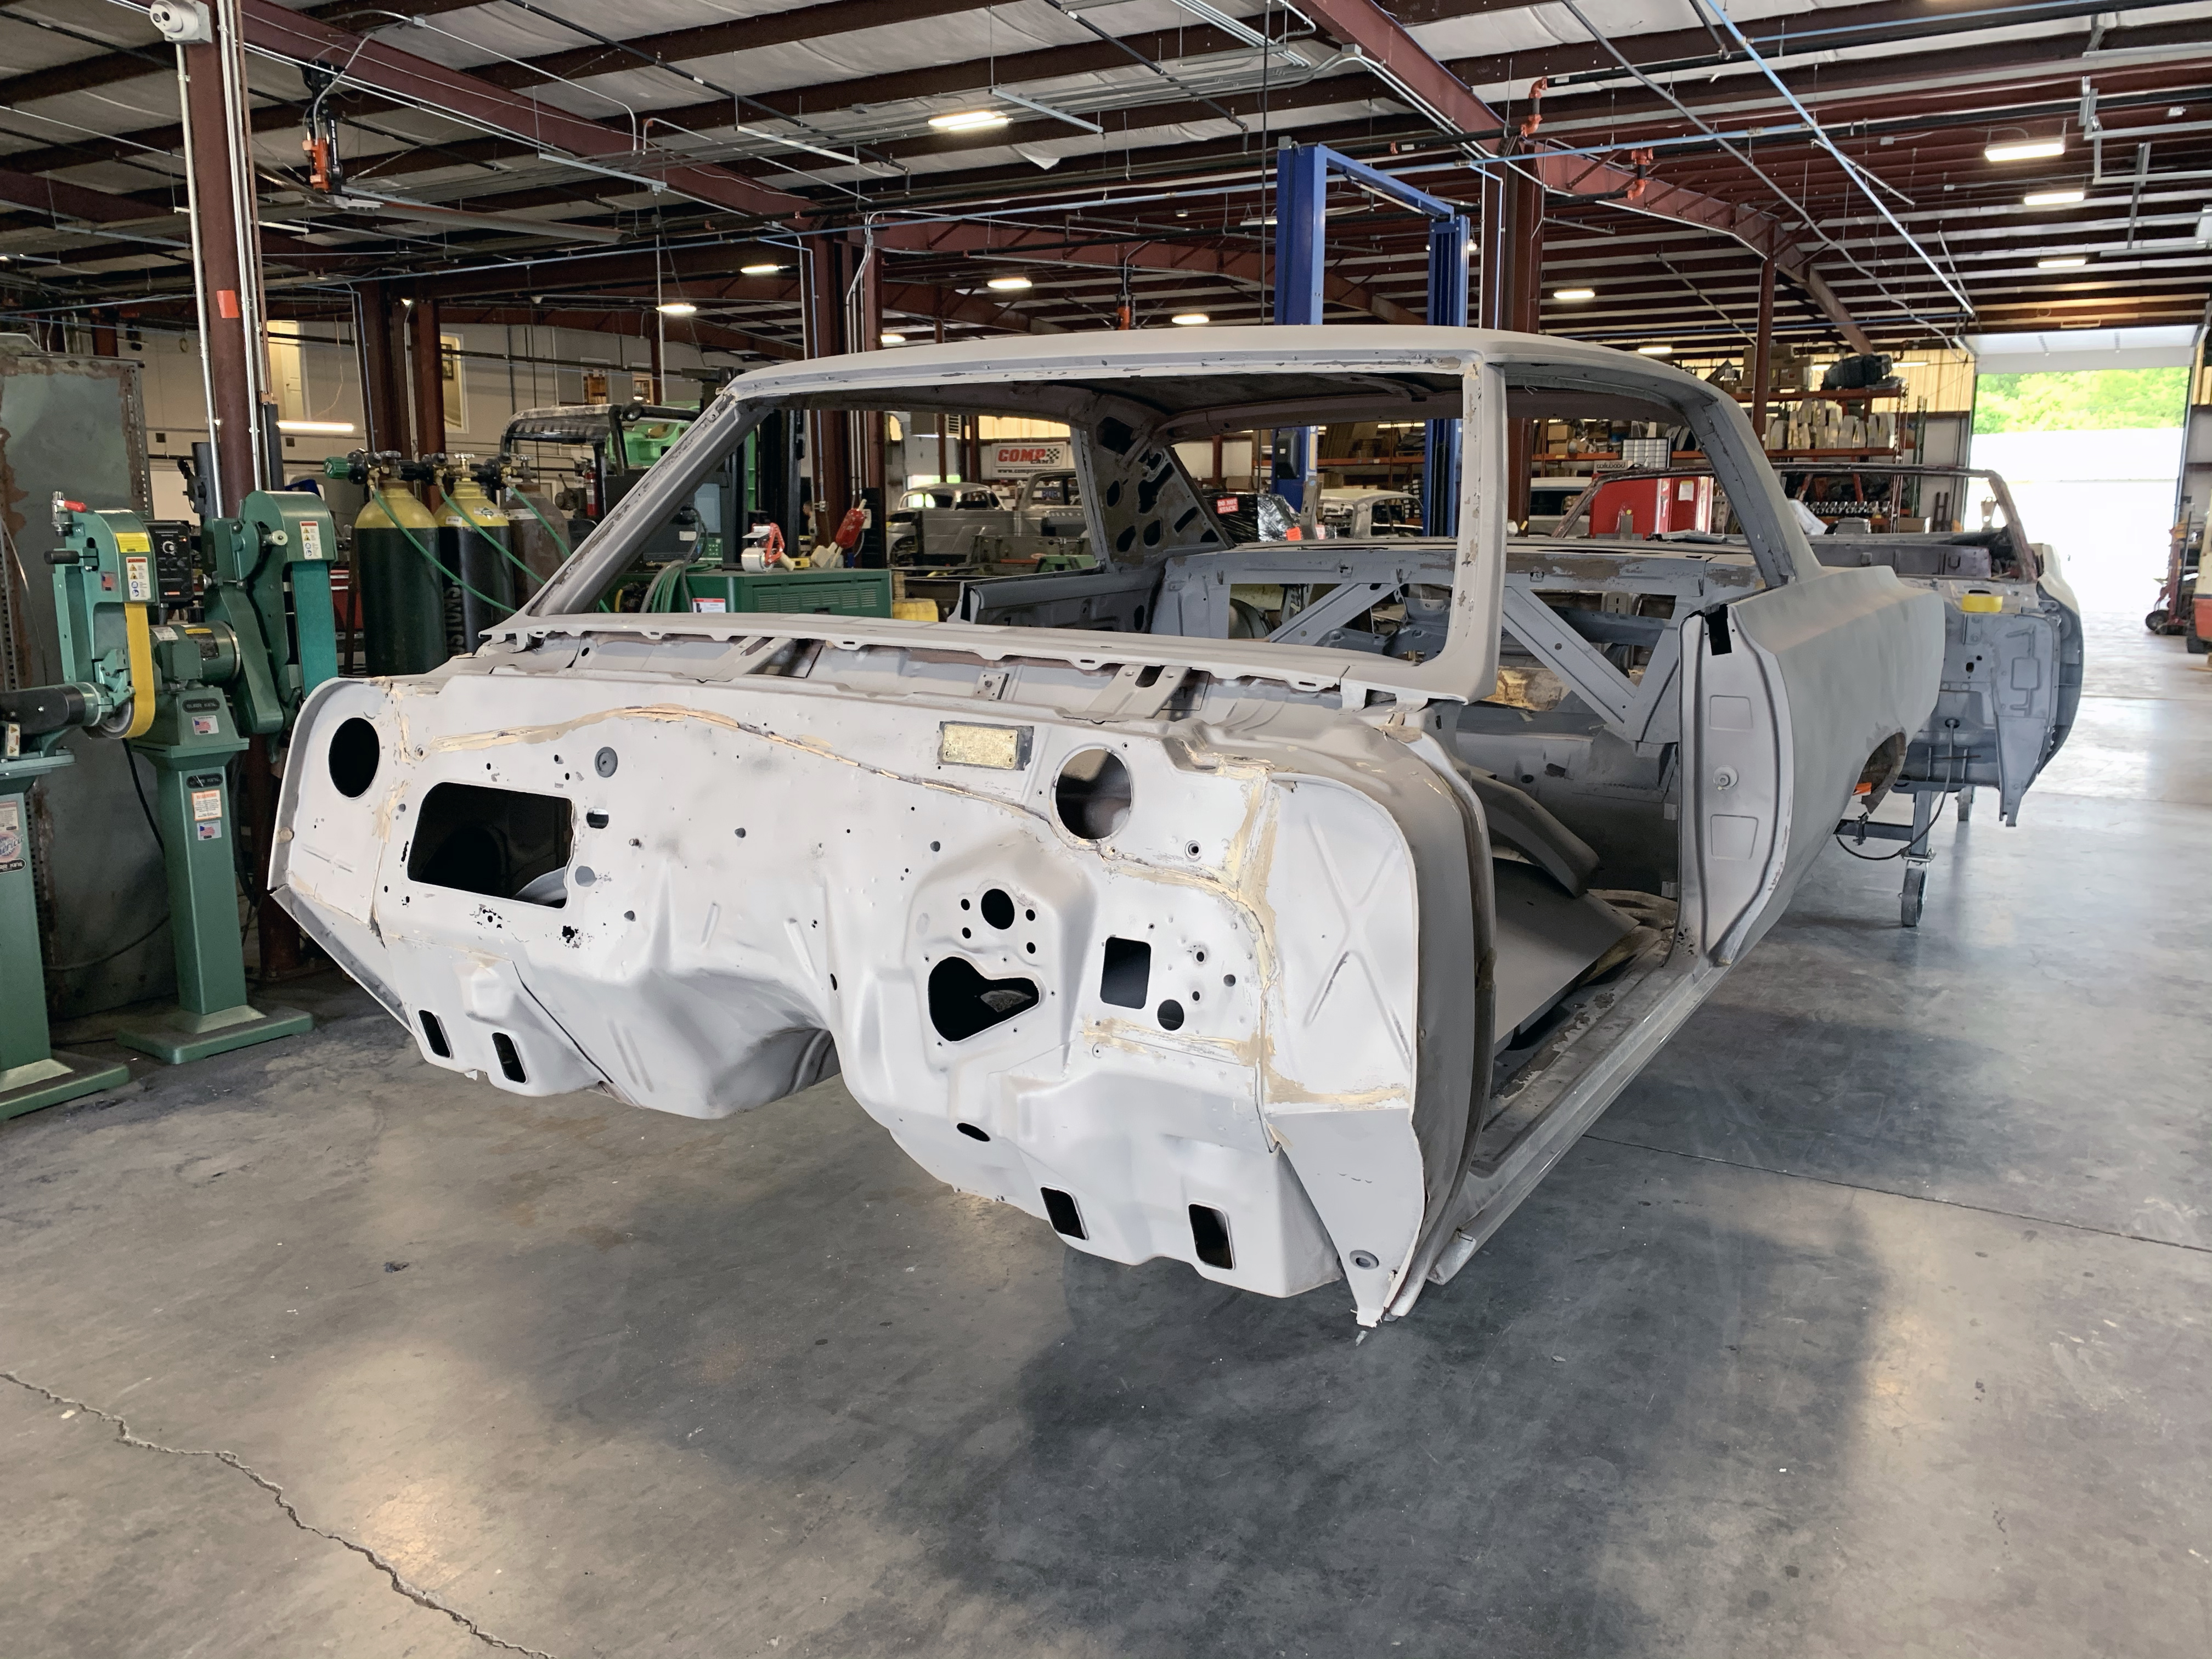 1_scotts-hotrods-65-cutlass-project-1